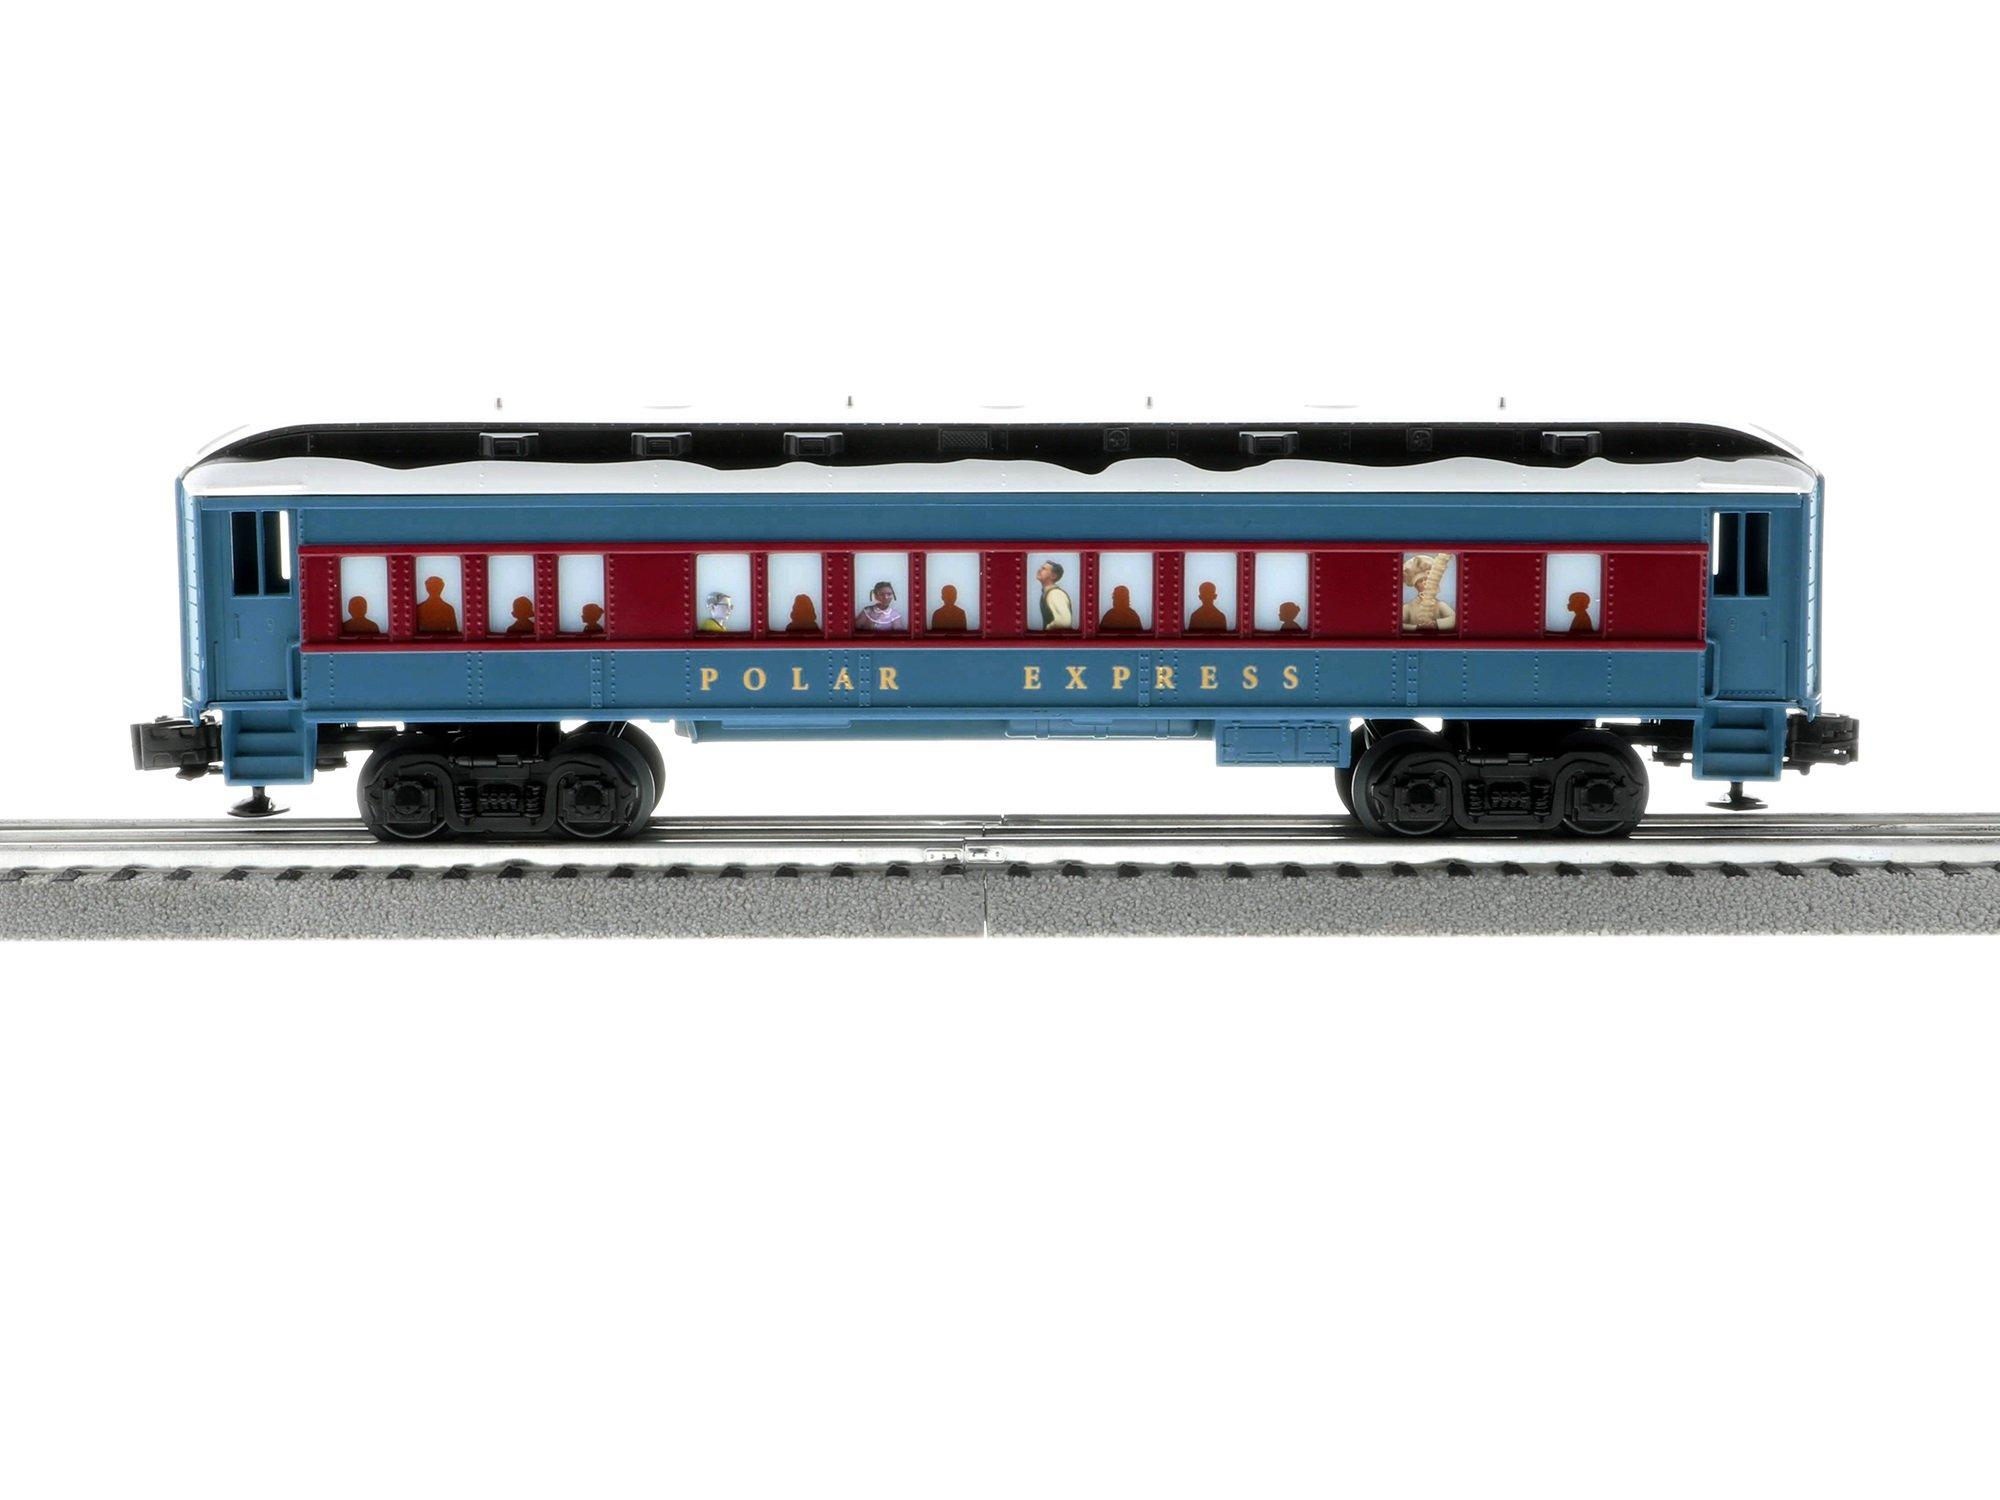 Lionel The Polar Express LionChief Train Set with Bluetooth Train Set by Lionel (Image #9)